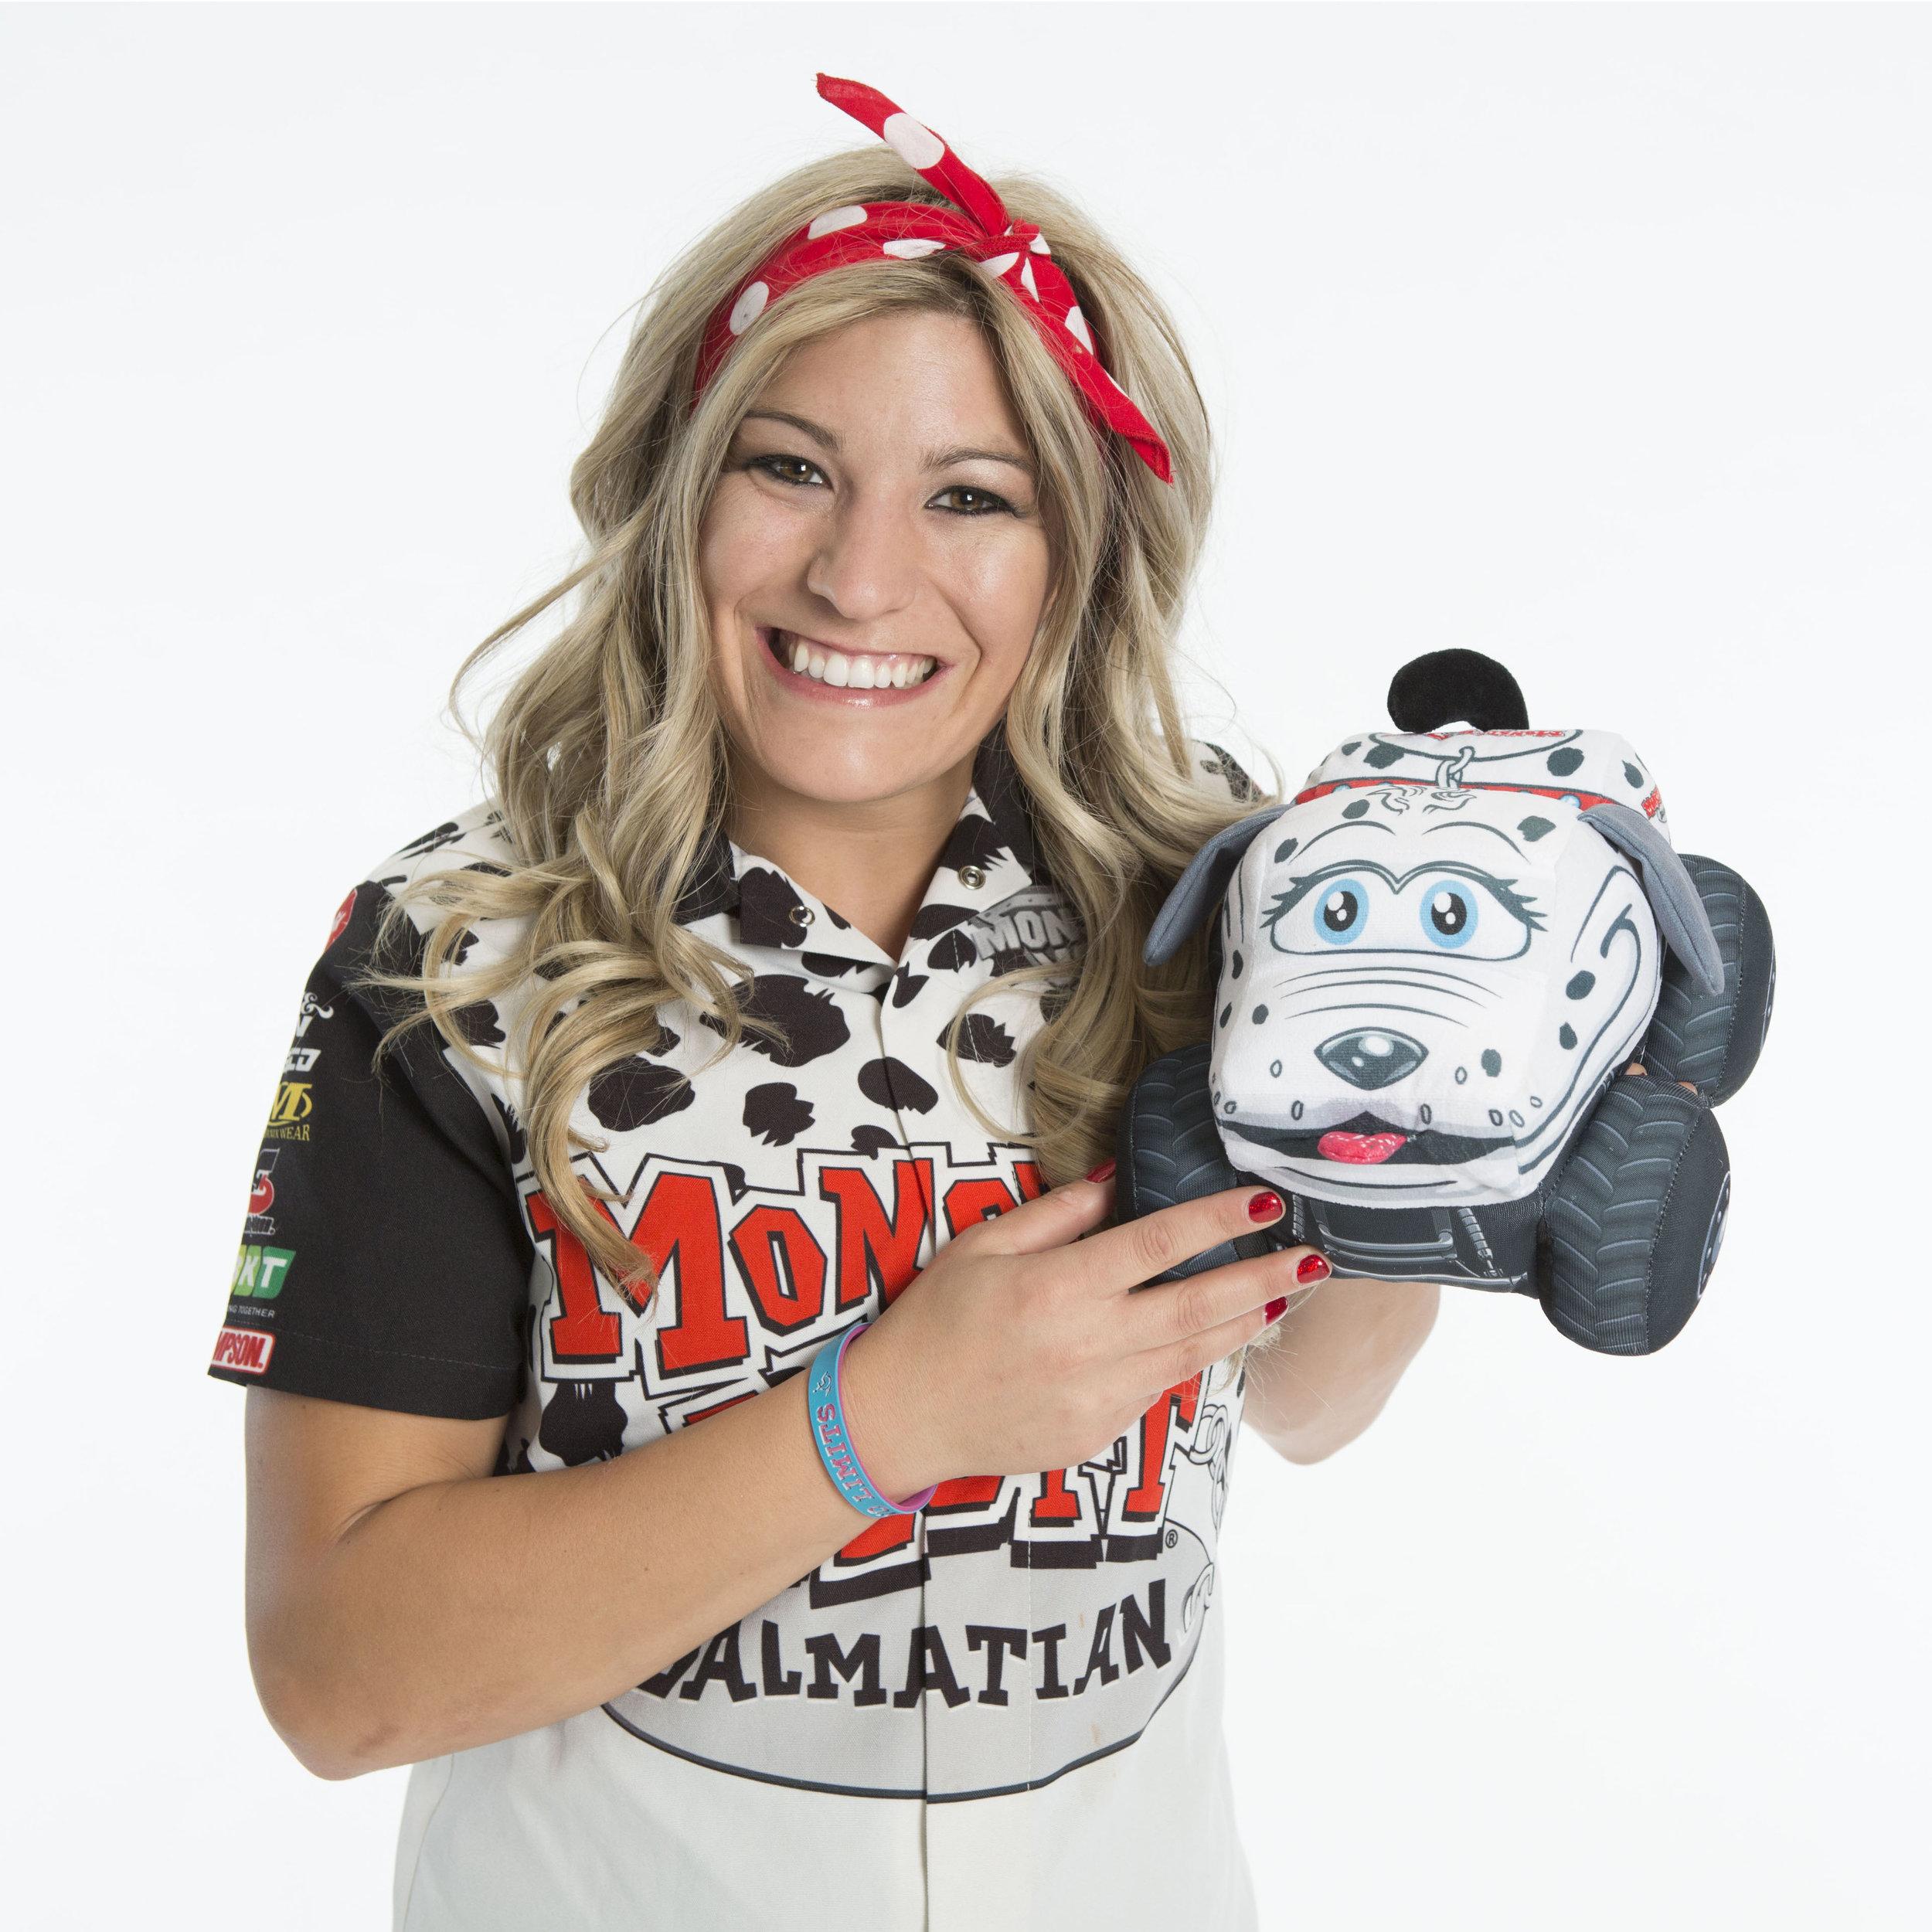 Cynthia Gauthier - Monster Jam Driver